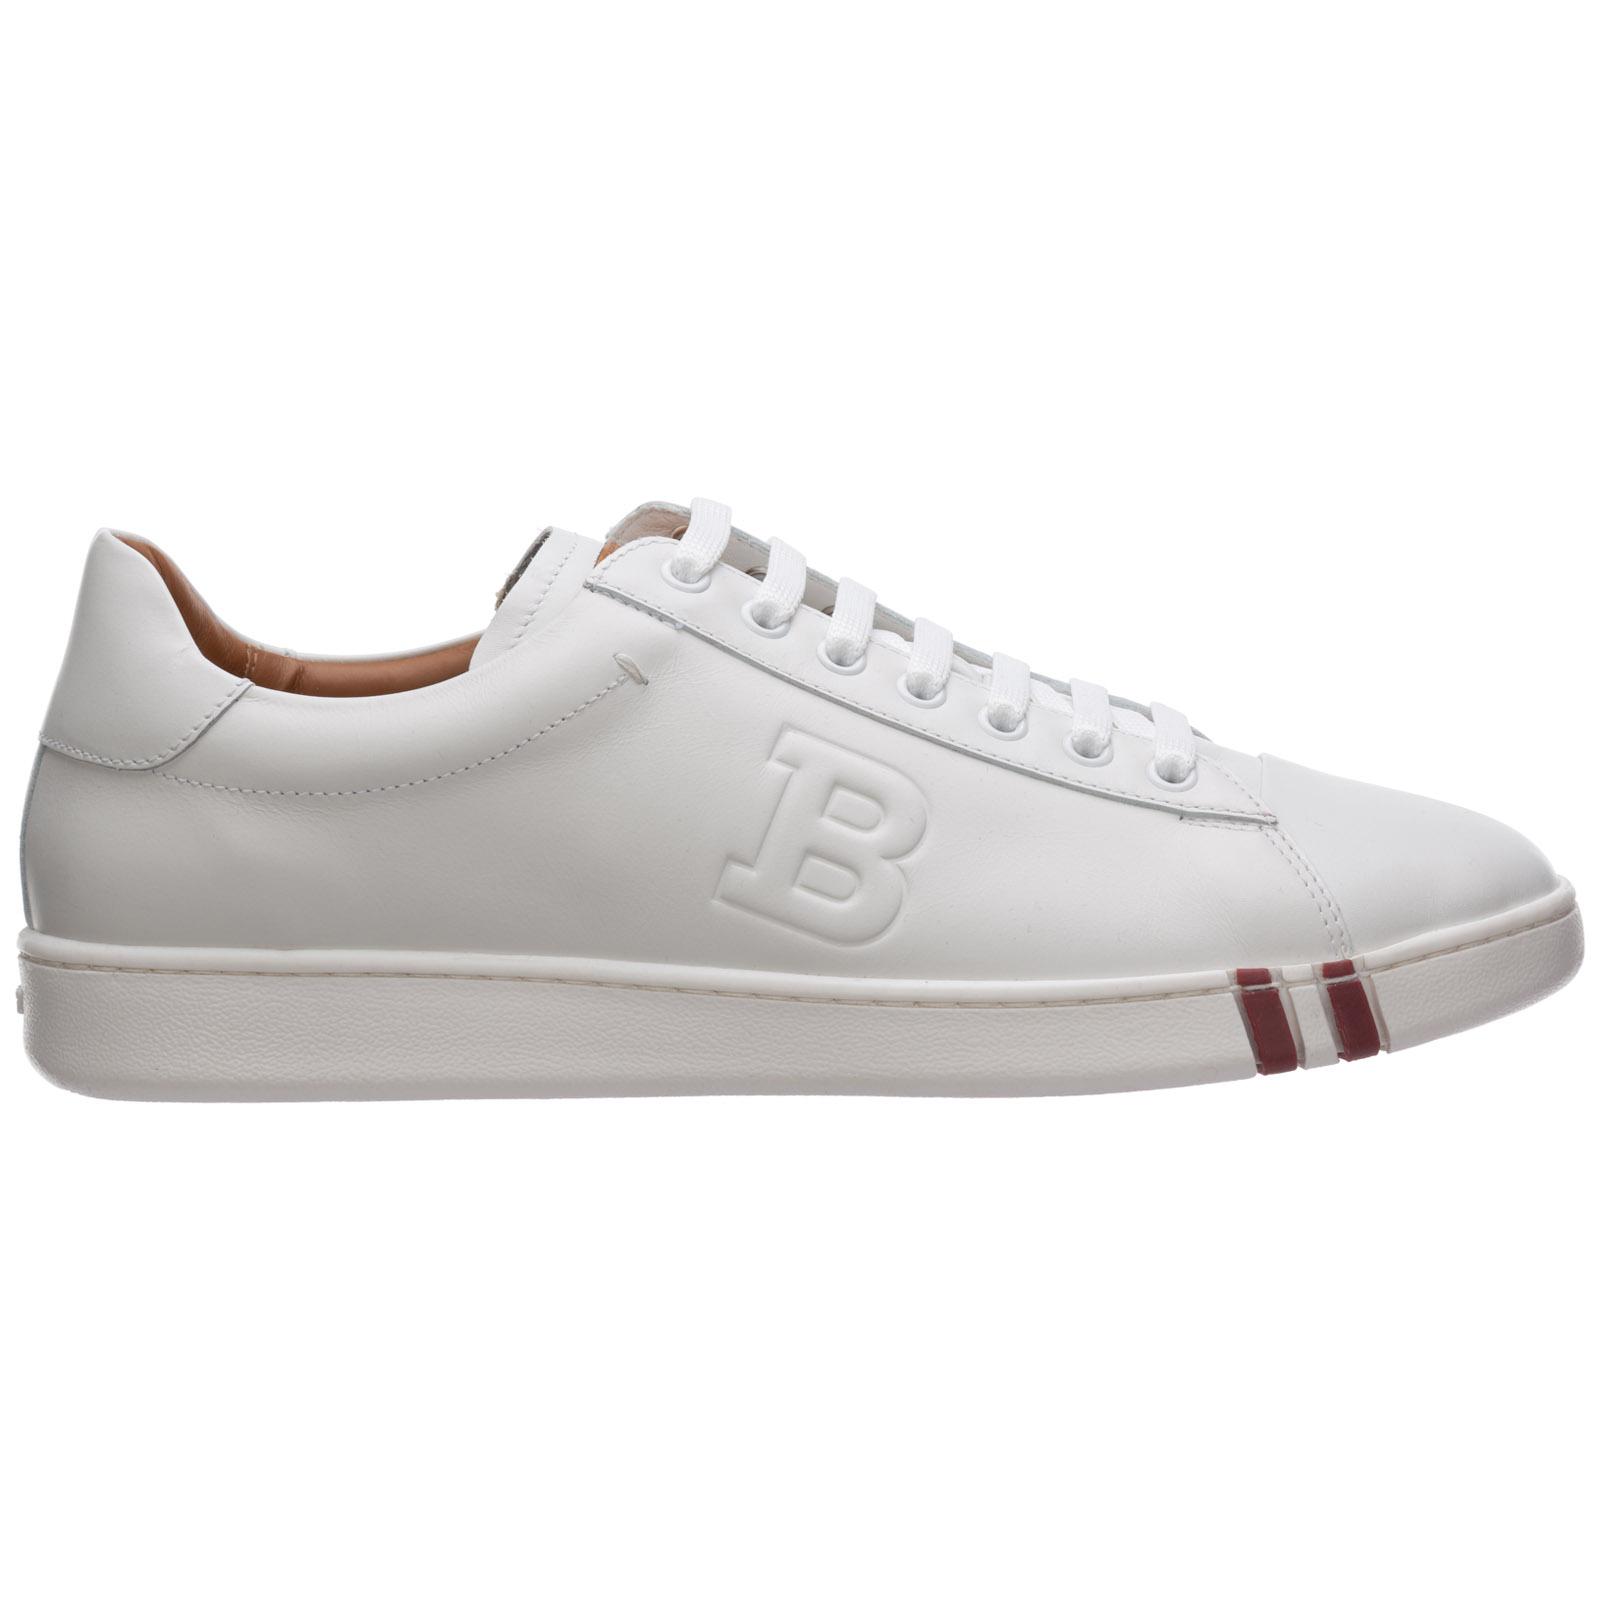 Sneakers Bally asher 6205250 bianco